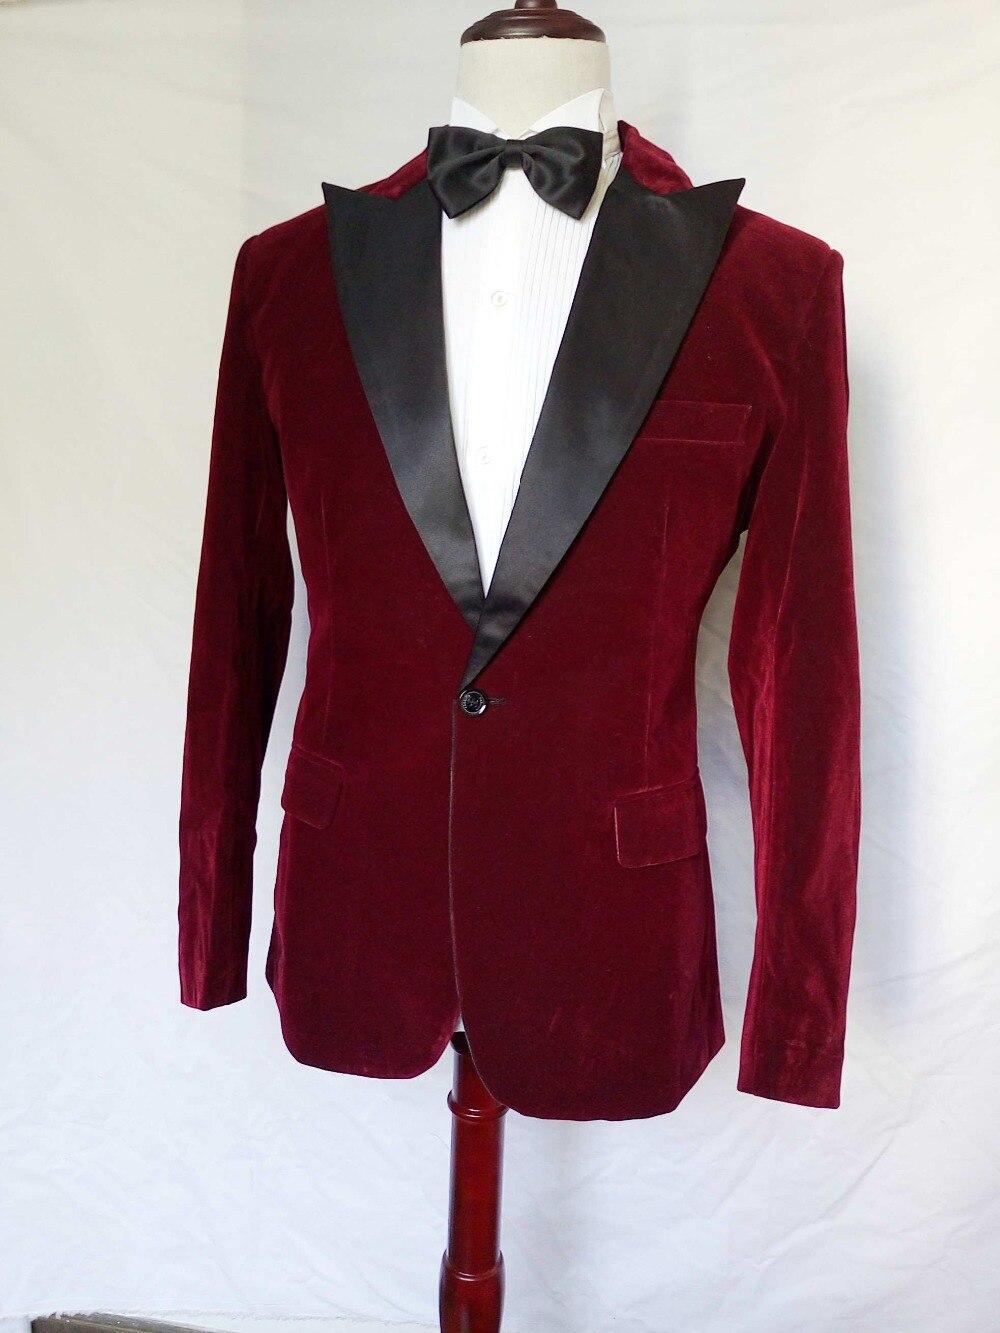 High Quality Dark Red Velvet Mens Suits Groom Tuxedos Groomsmen Wedding Party Dinner Best Man Suits (Jacket+Pants+Tie) K:2231